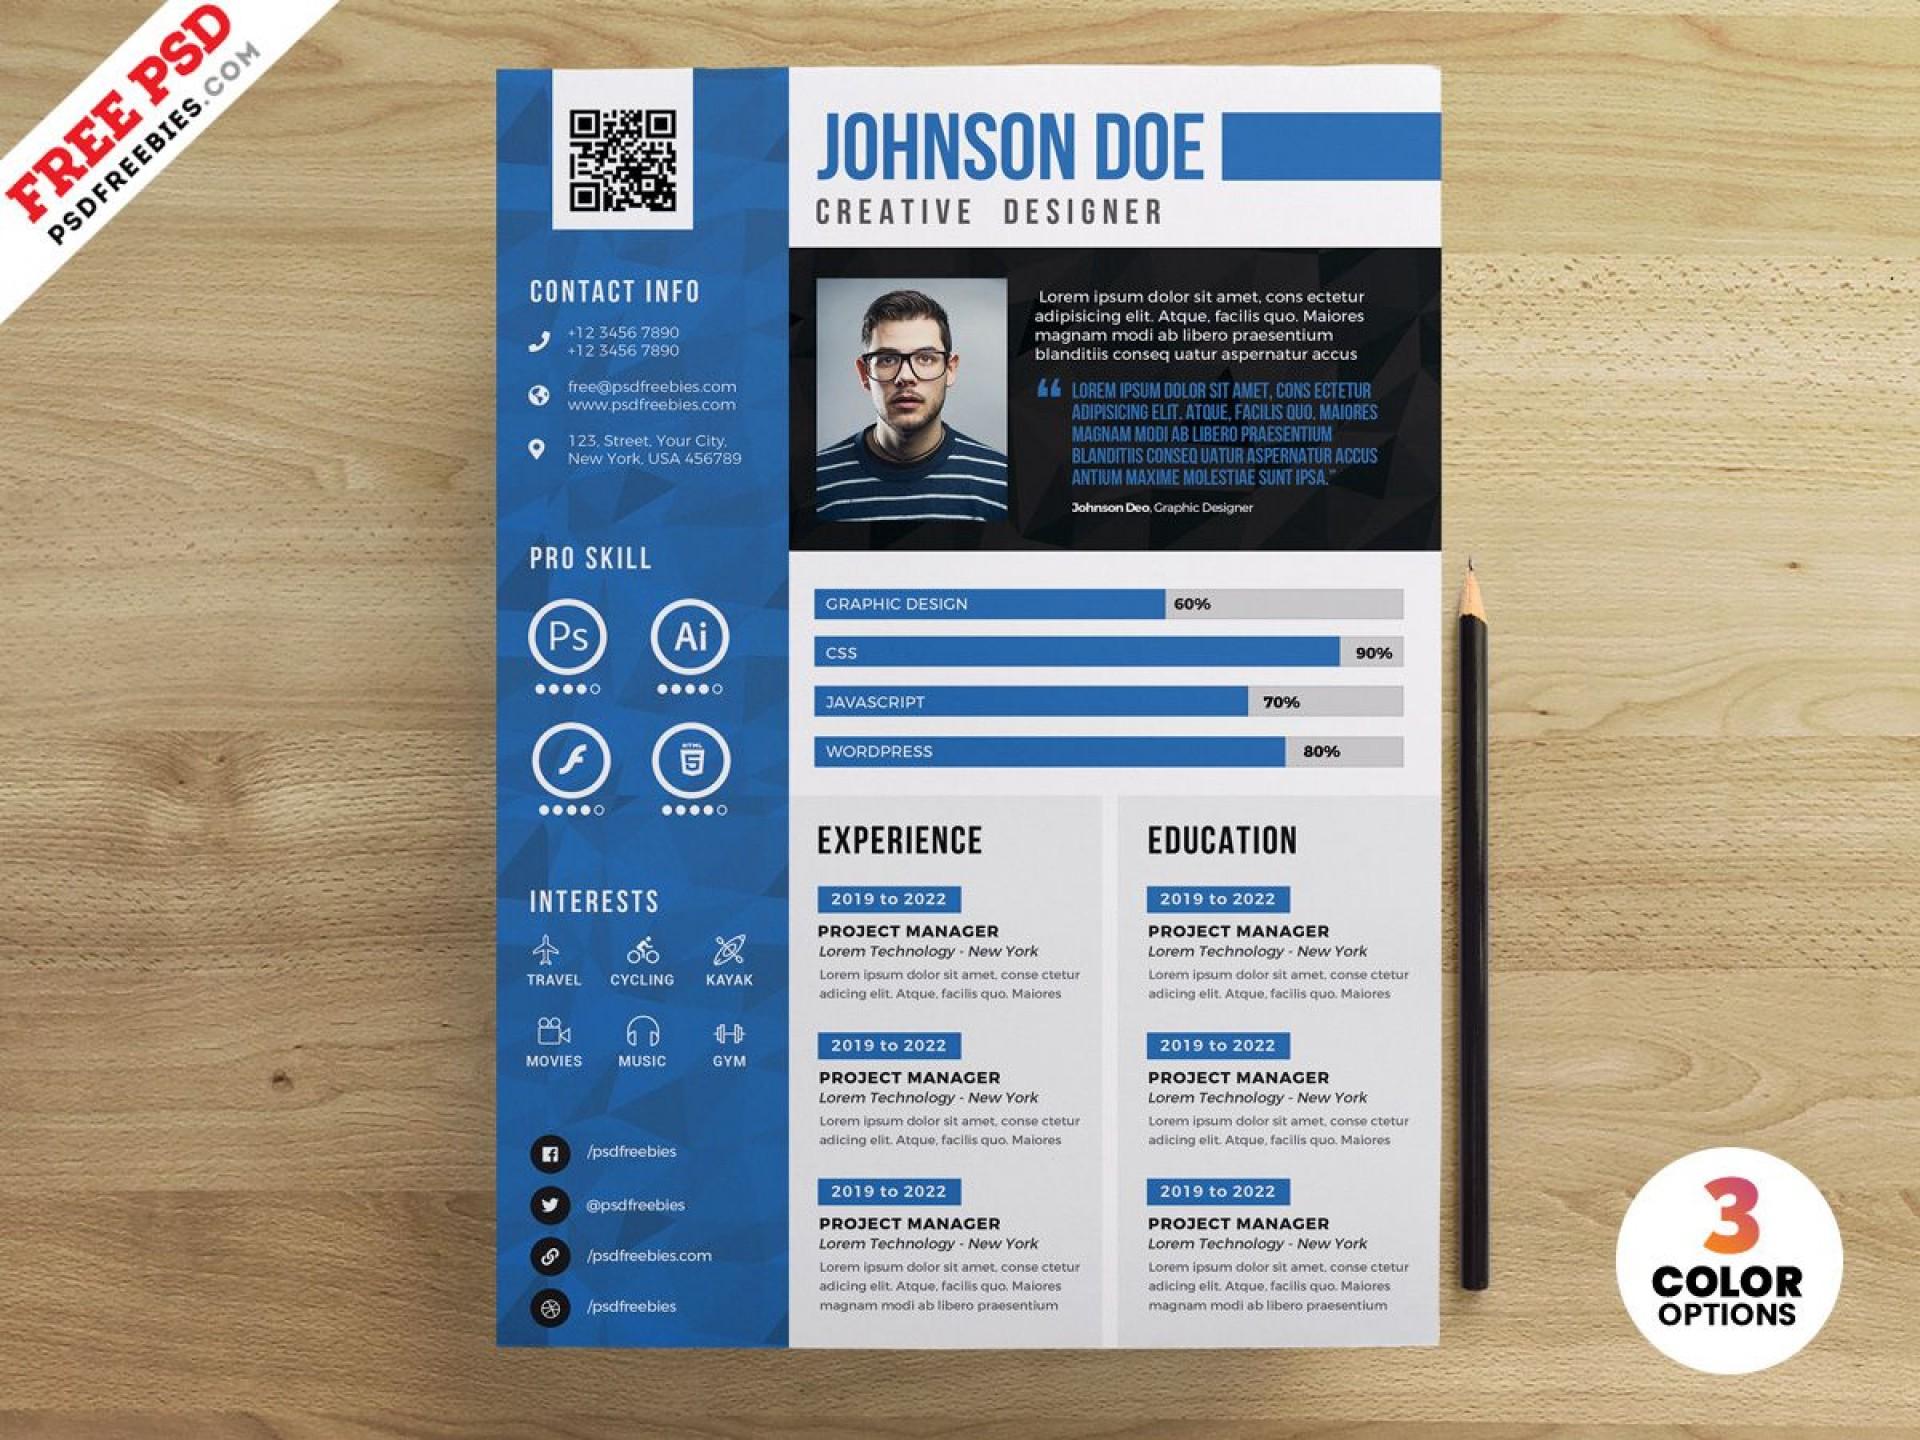 007 Excellent Cv Design Photoshop Template Free Photo  Resume Psd Download1920